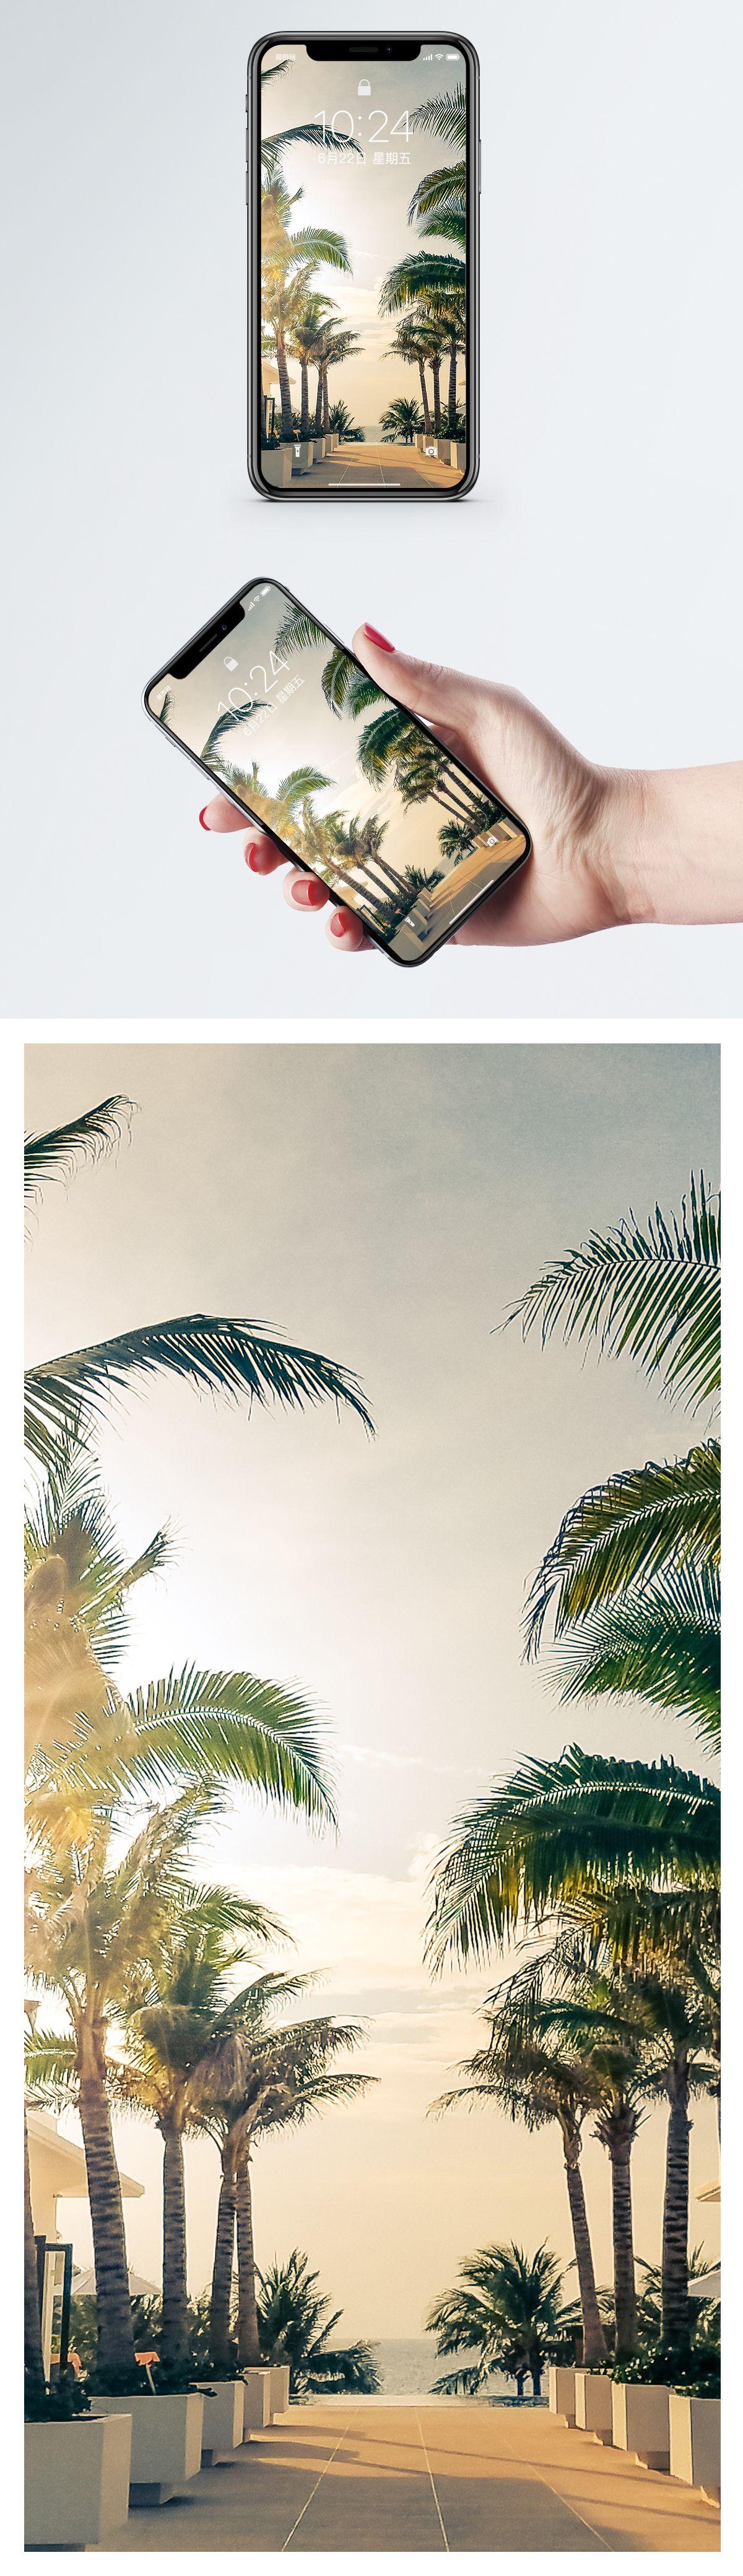 Tropical scenic handset wallpaper Landscape mobile phone